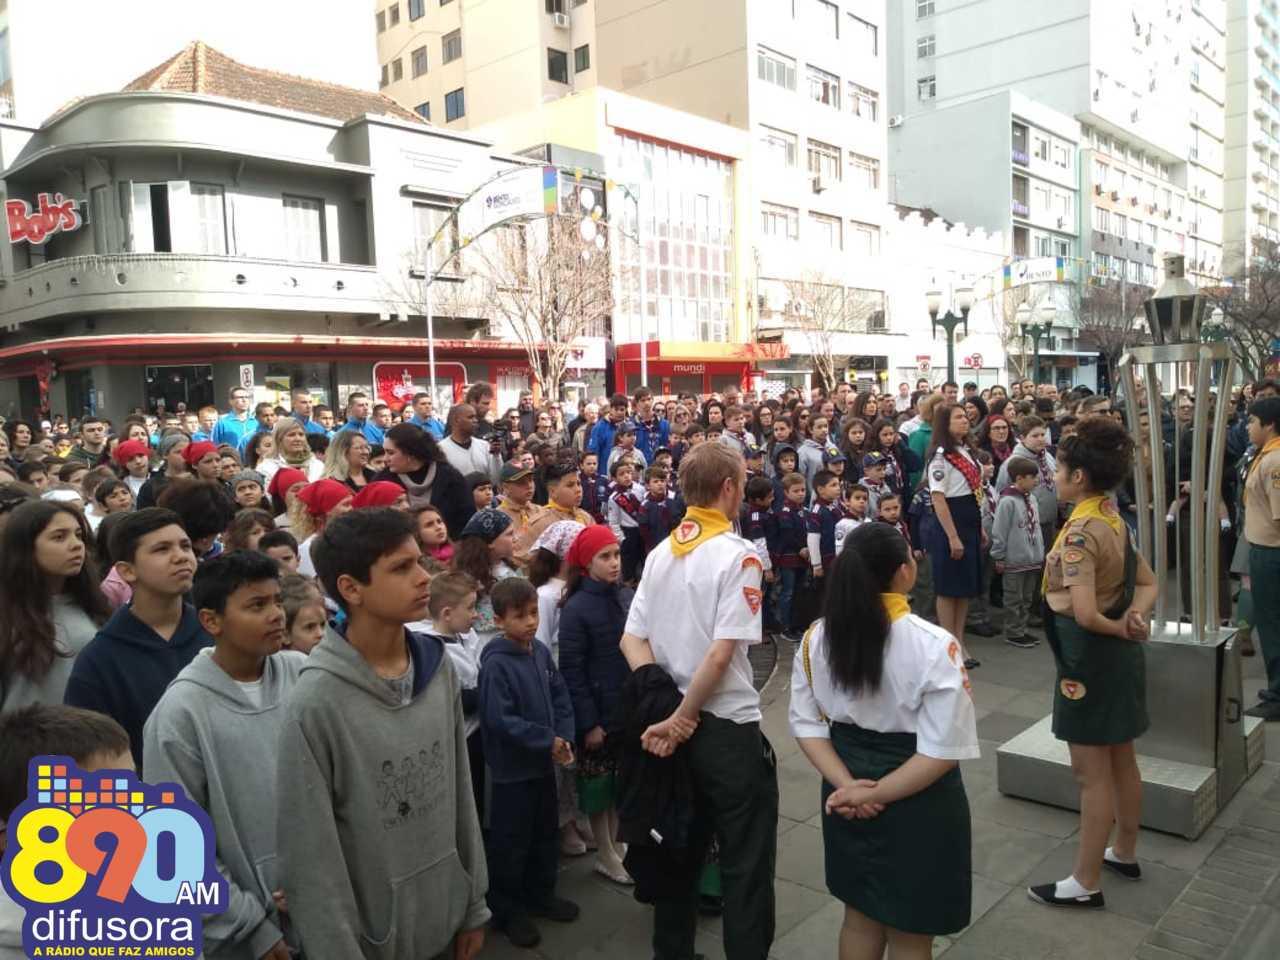 Ato no centro de Bento marca a abertura oficial da Semana da Pátria